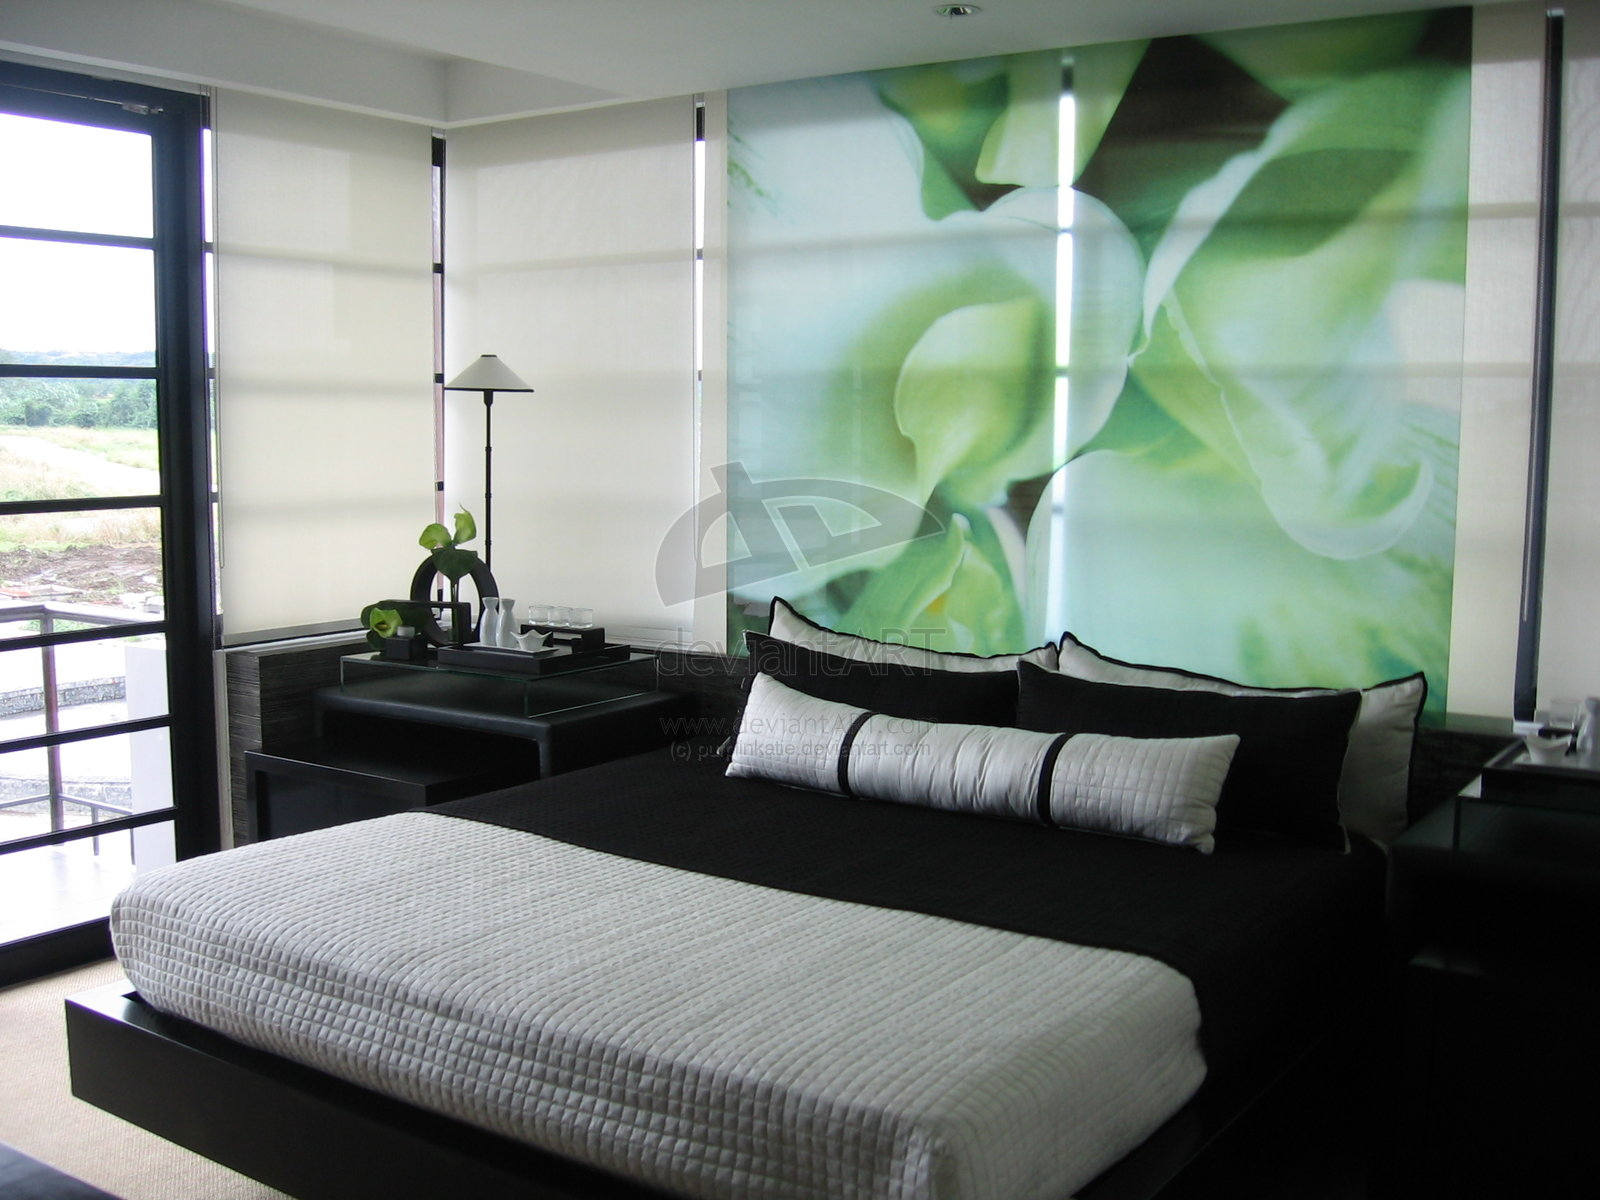 green color bedrooms bedrooms philip house